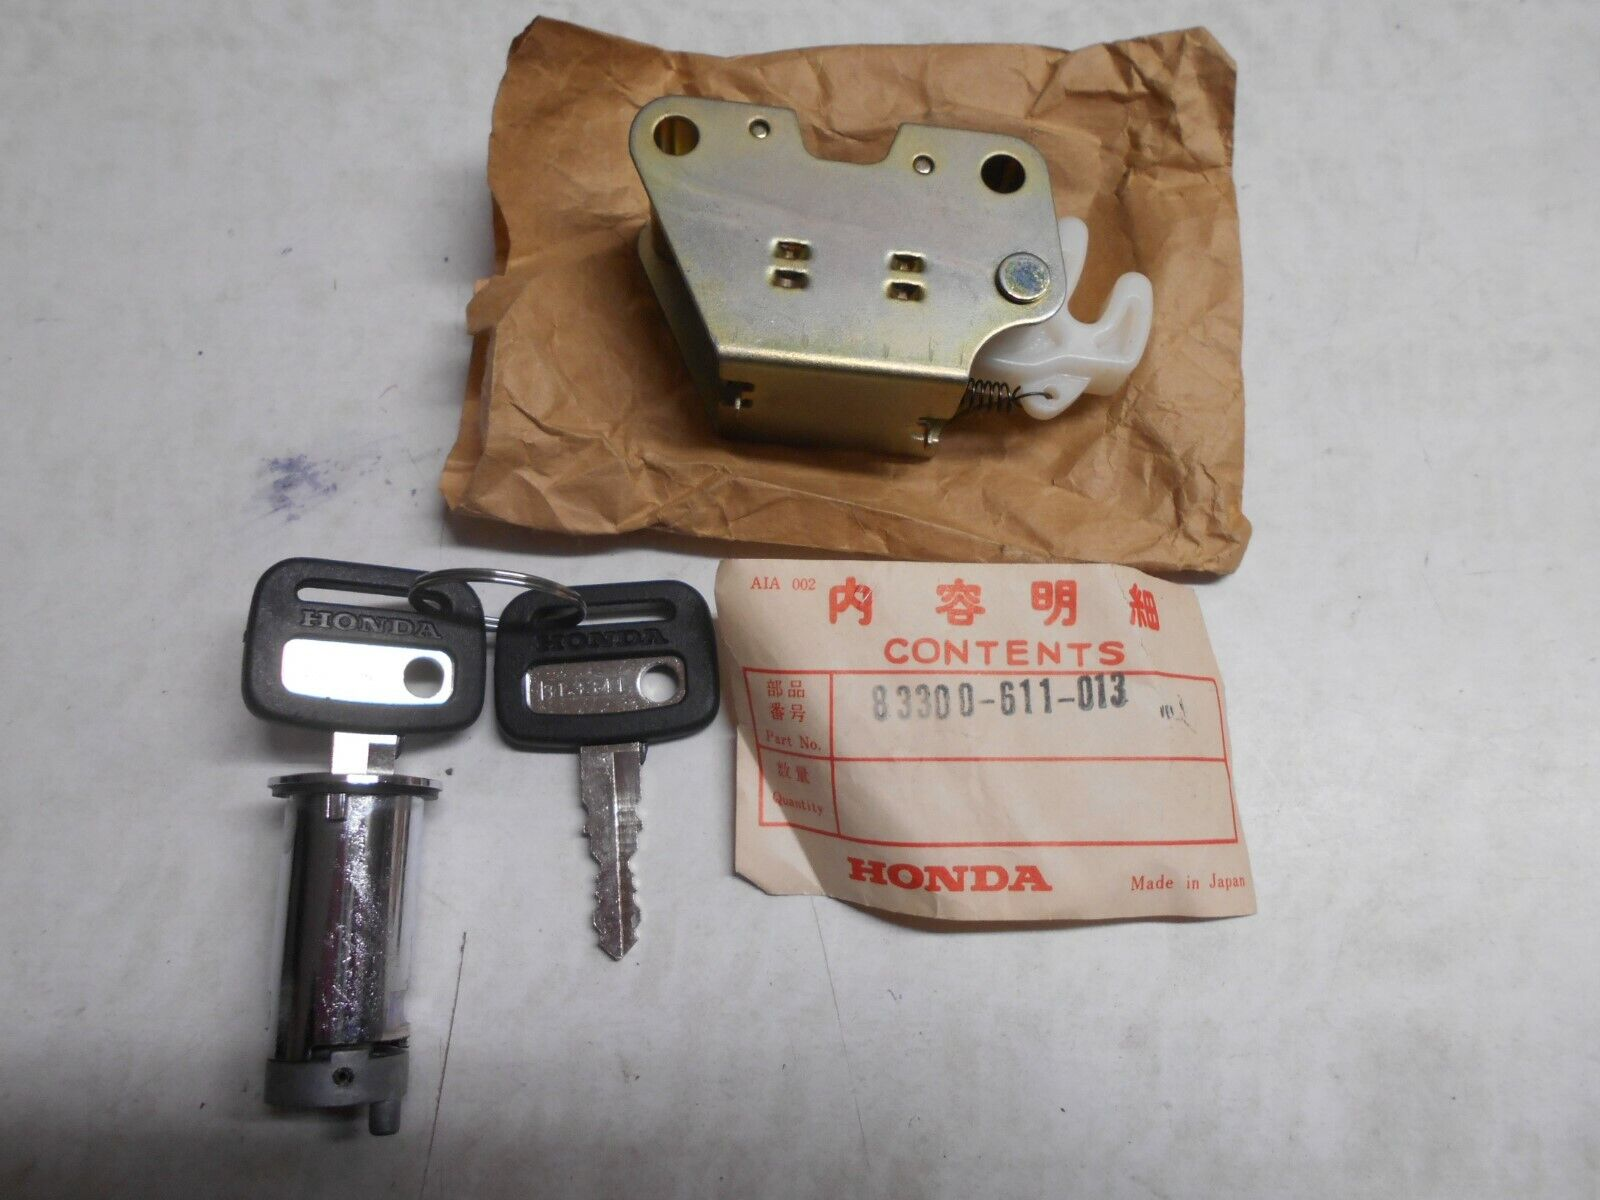 Car Parts - GENUINE HONDA CAR PARTS TRUNK LOCK ASSEMBLY N360K1 LIFE KT KU 83300-611-013